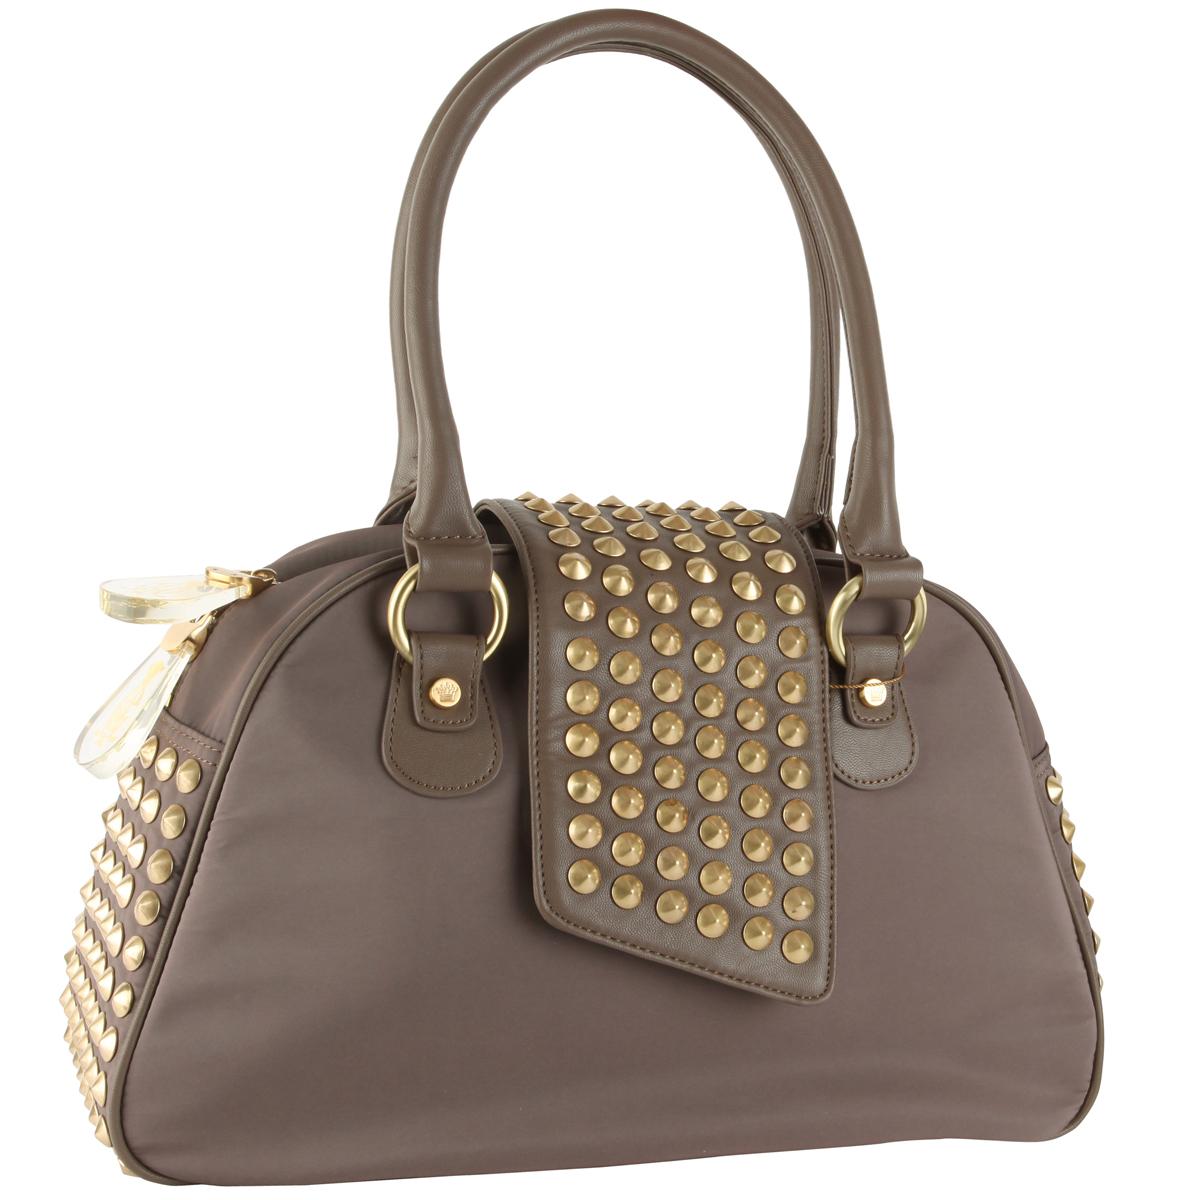 Christian Audigier Gwen Bowler Handbag - Taupe